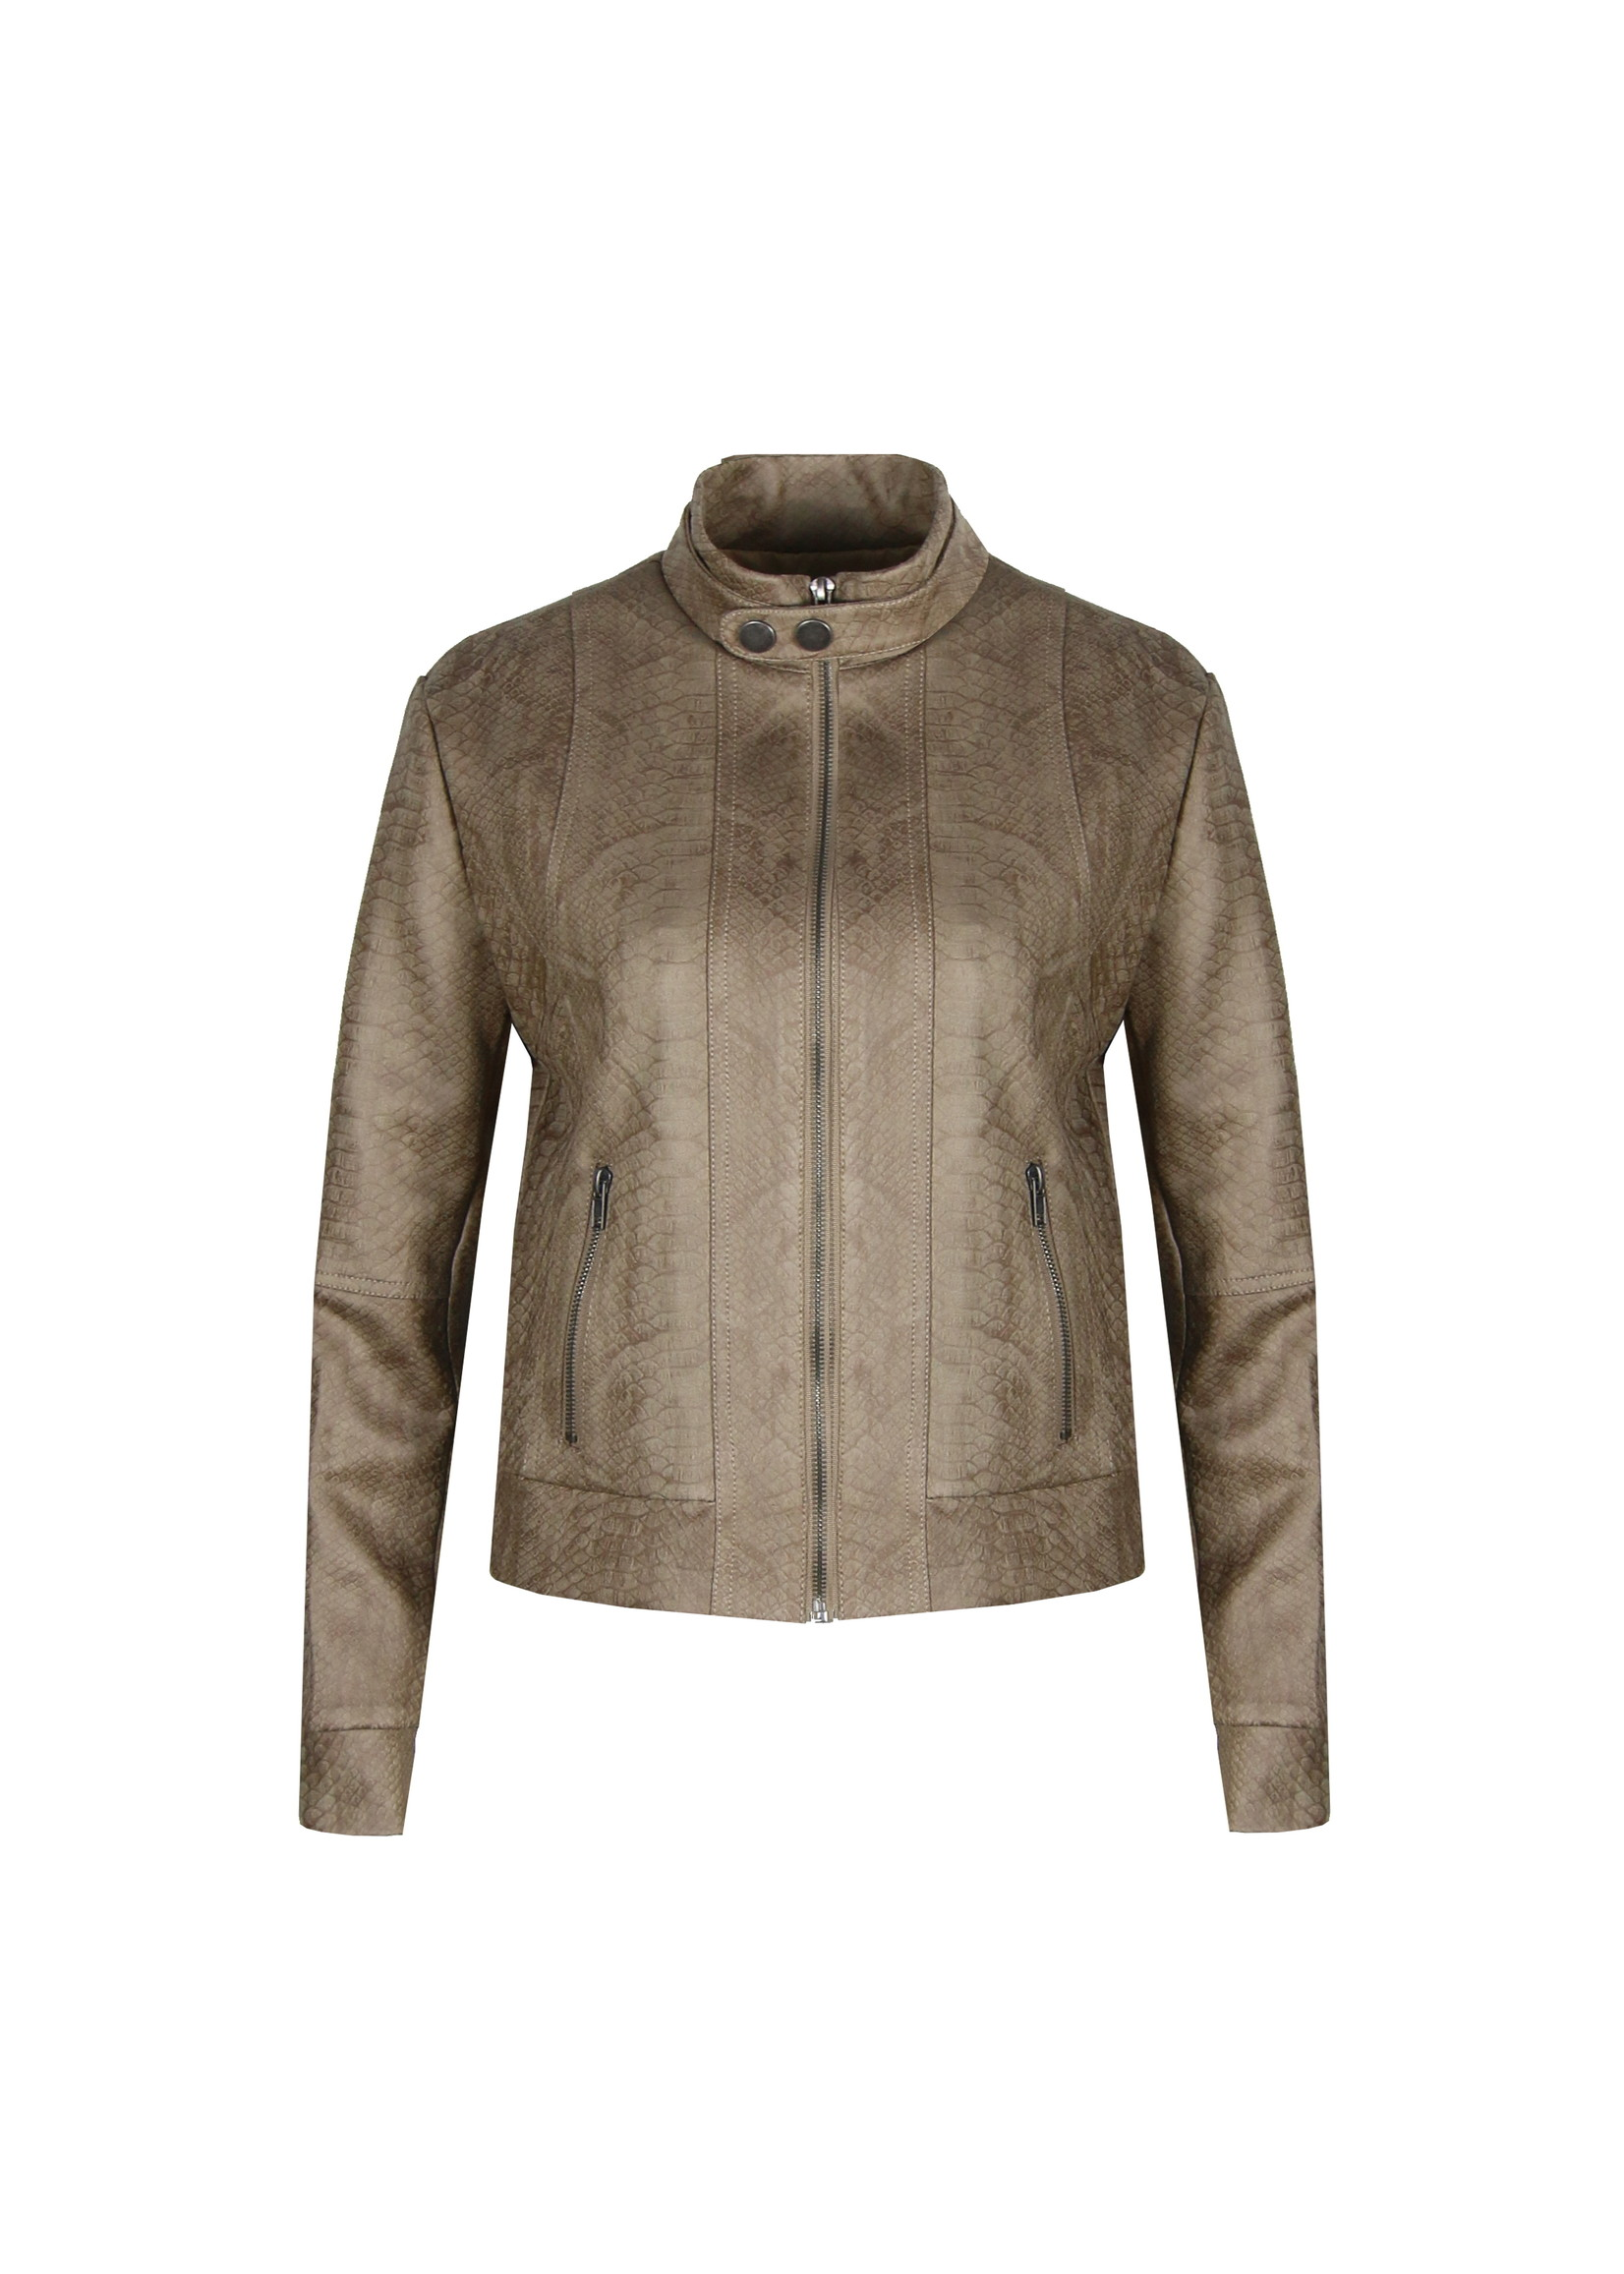 Zoso G-Maxx - Cosja - jacket - Sahara kleur